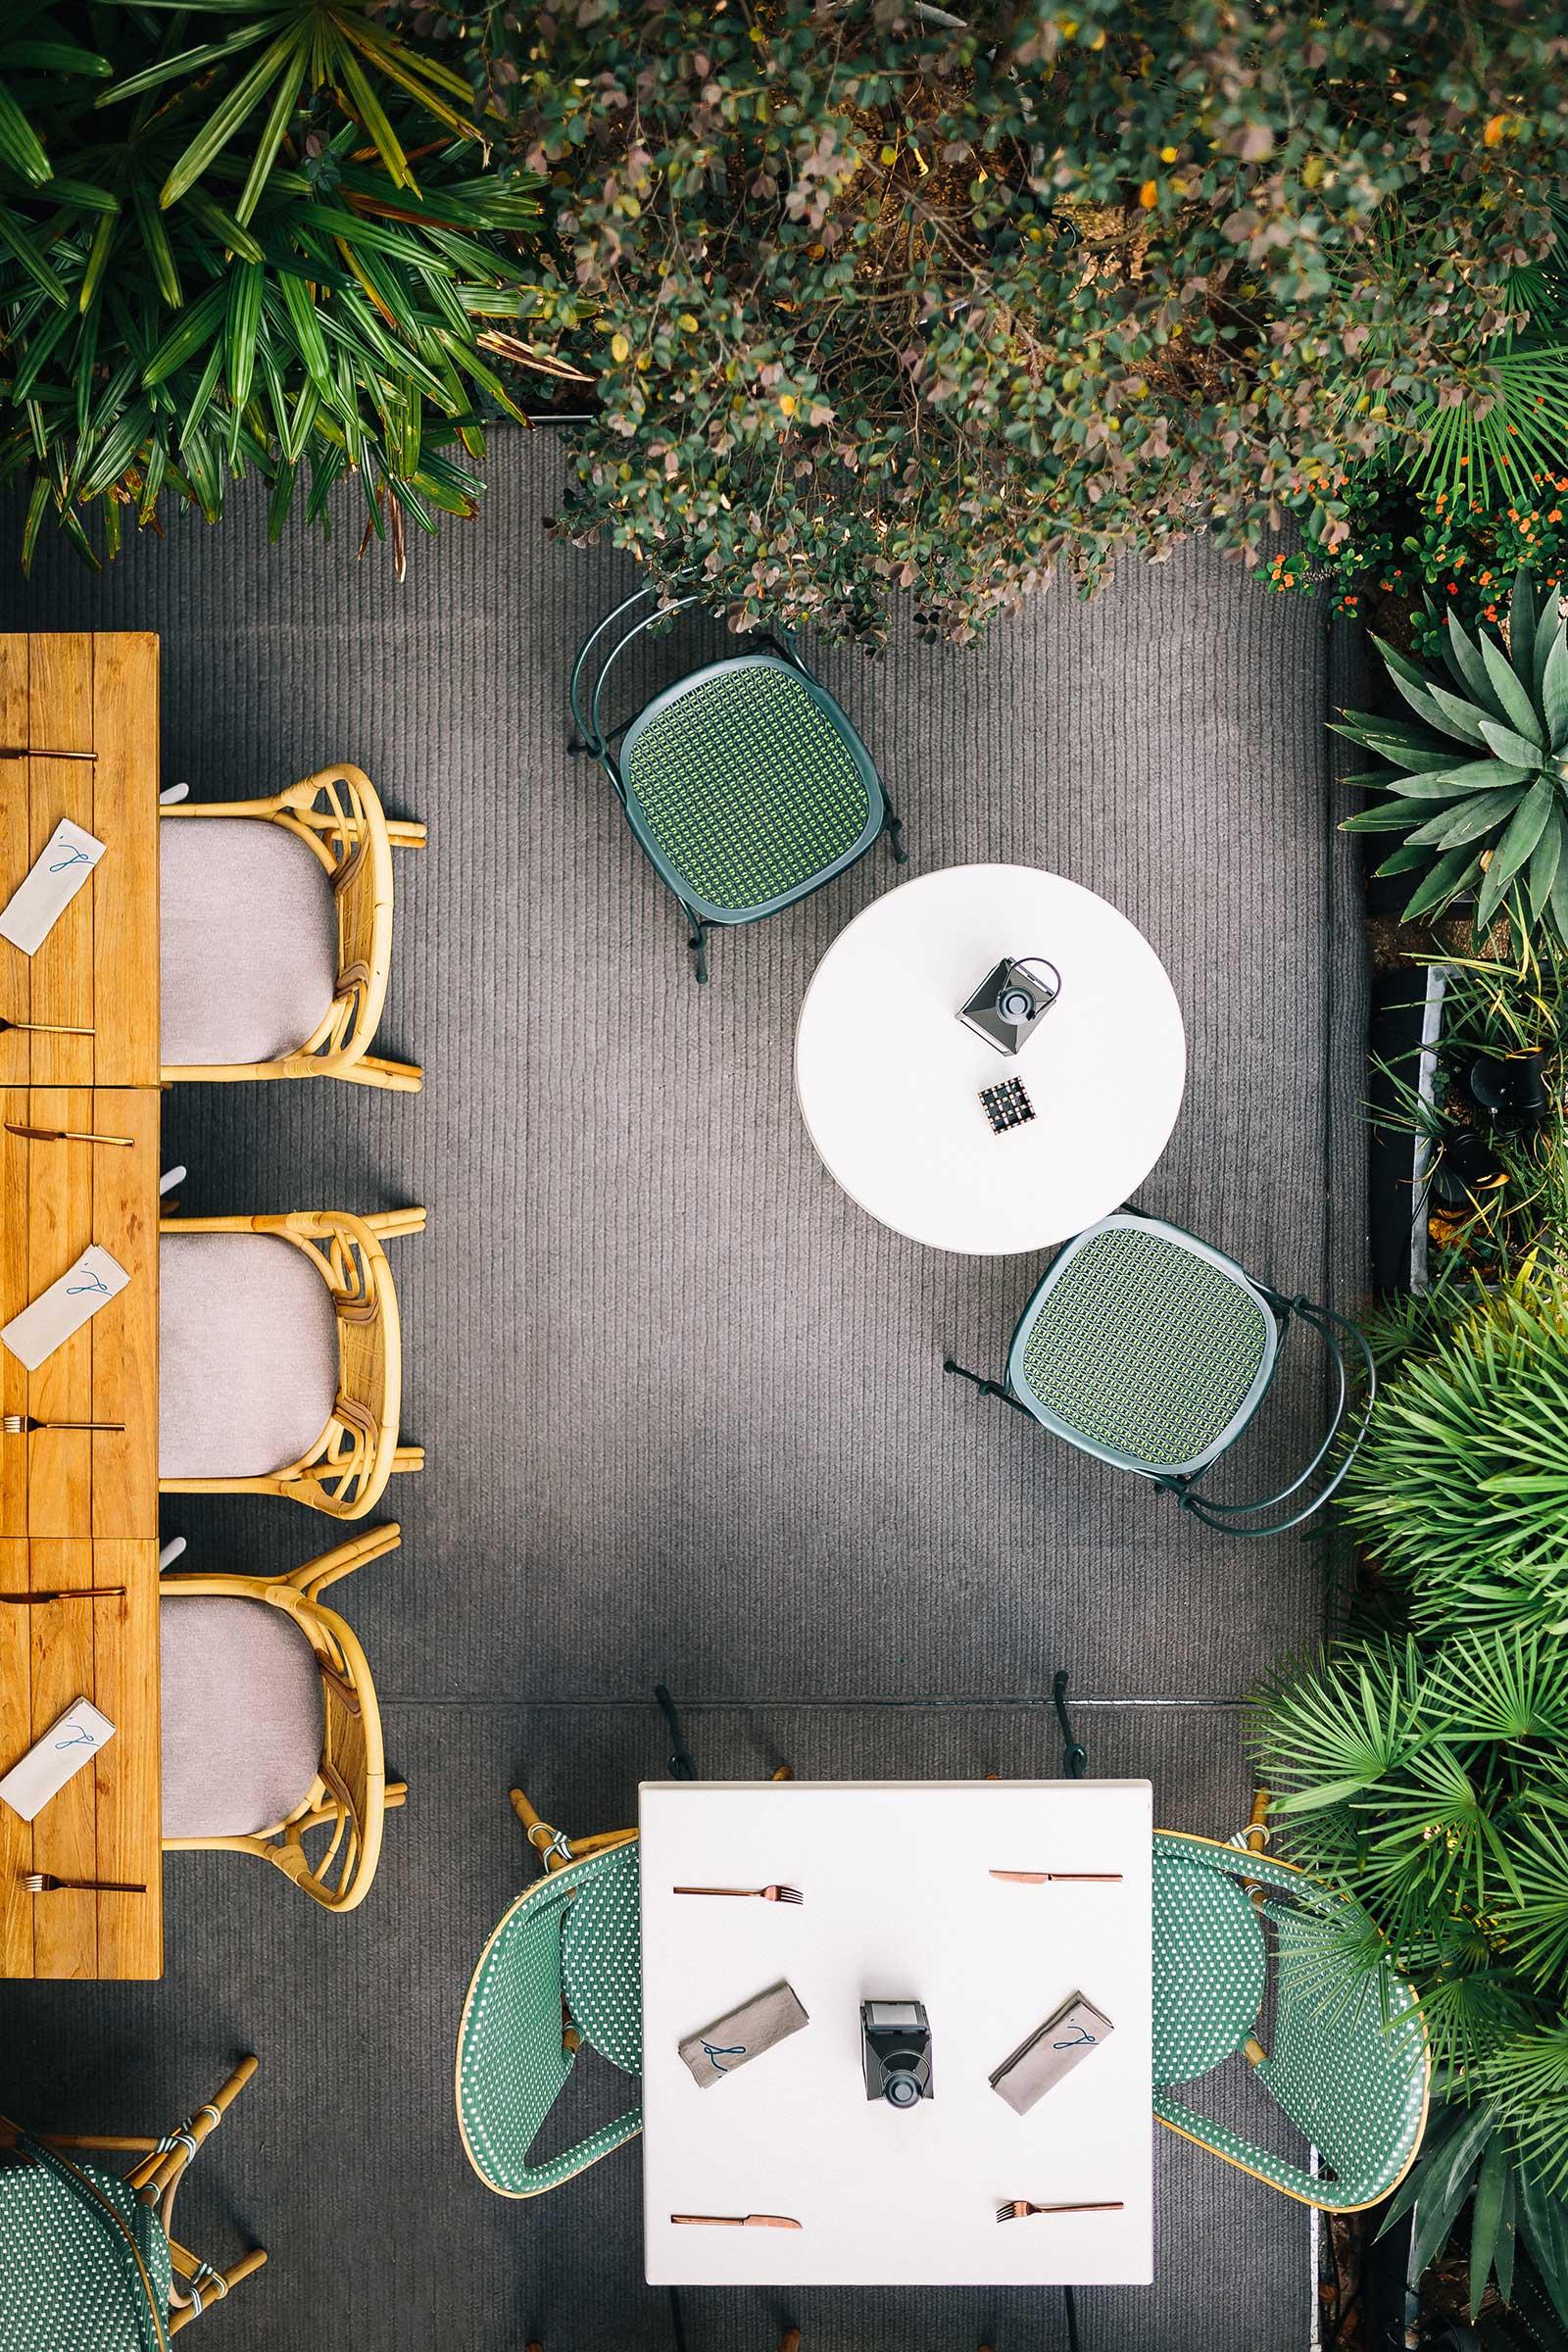 Louise_Terrace-Overhead.jpg